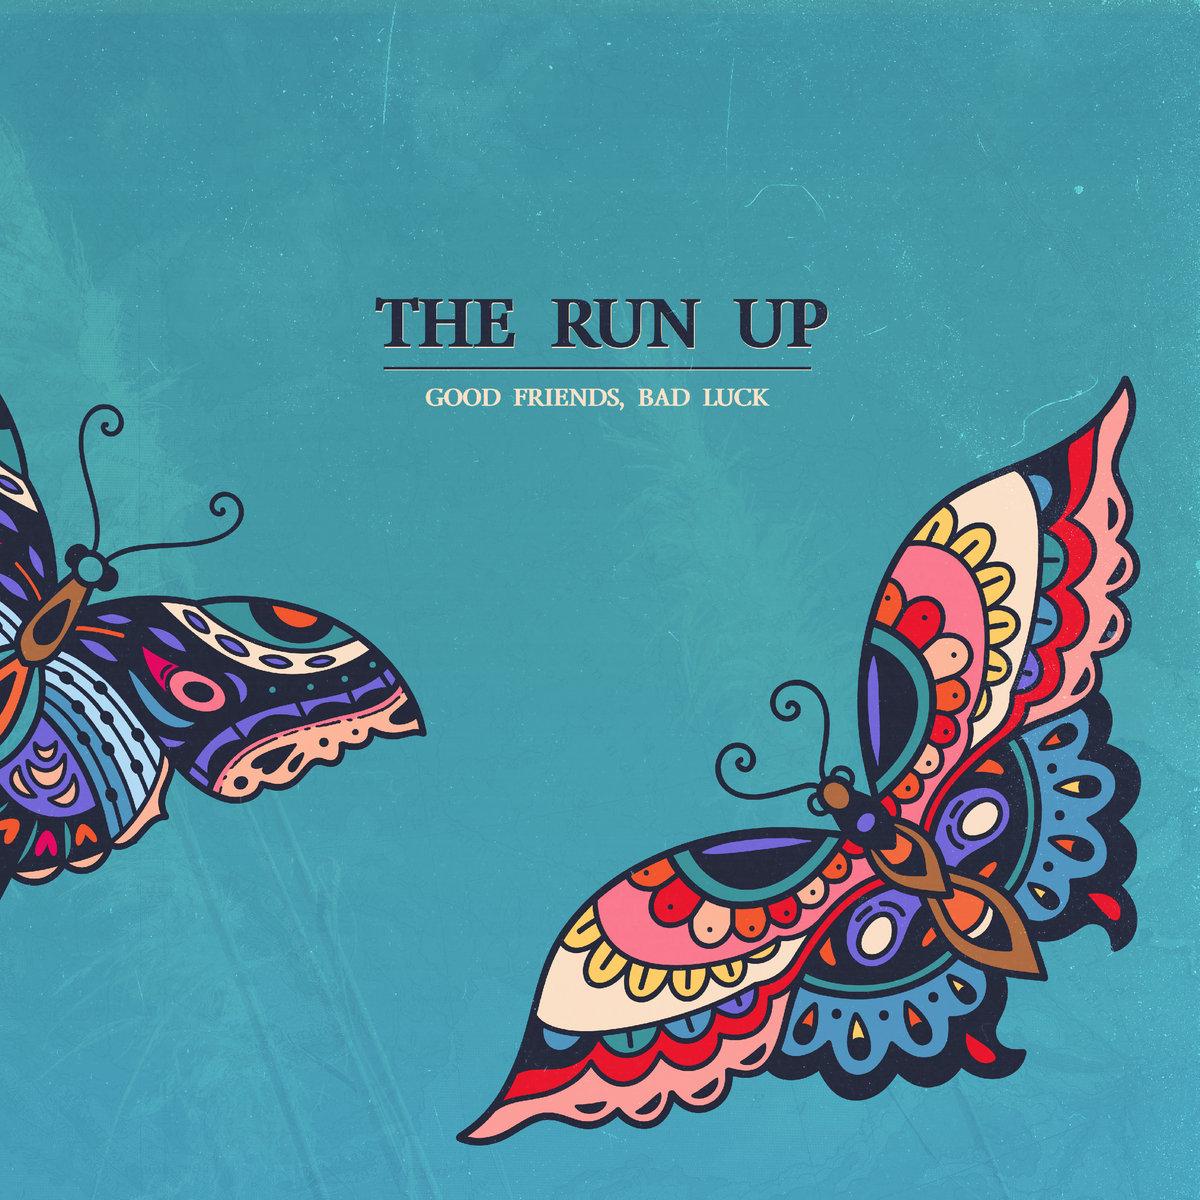 The Run Up Good Friends, Bad Luck Punk Rock Theory